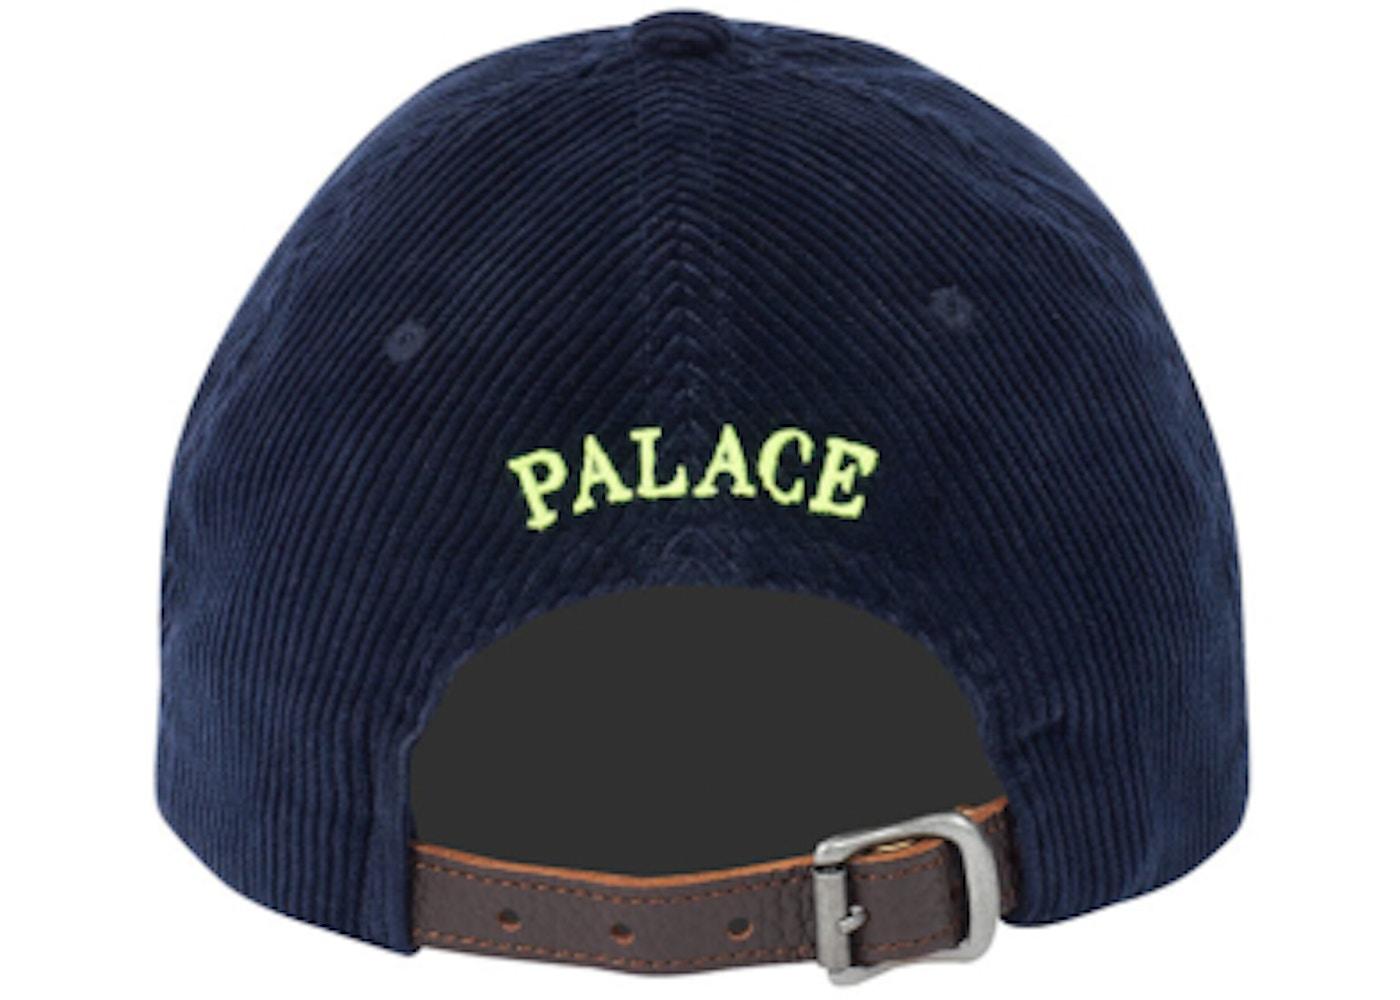 Palace Ralph Lauren Corduroy Classic Polo Cap Aviator Navy - FW18 018fa4afc55